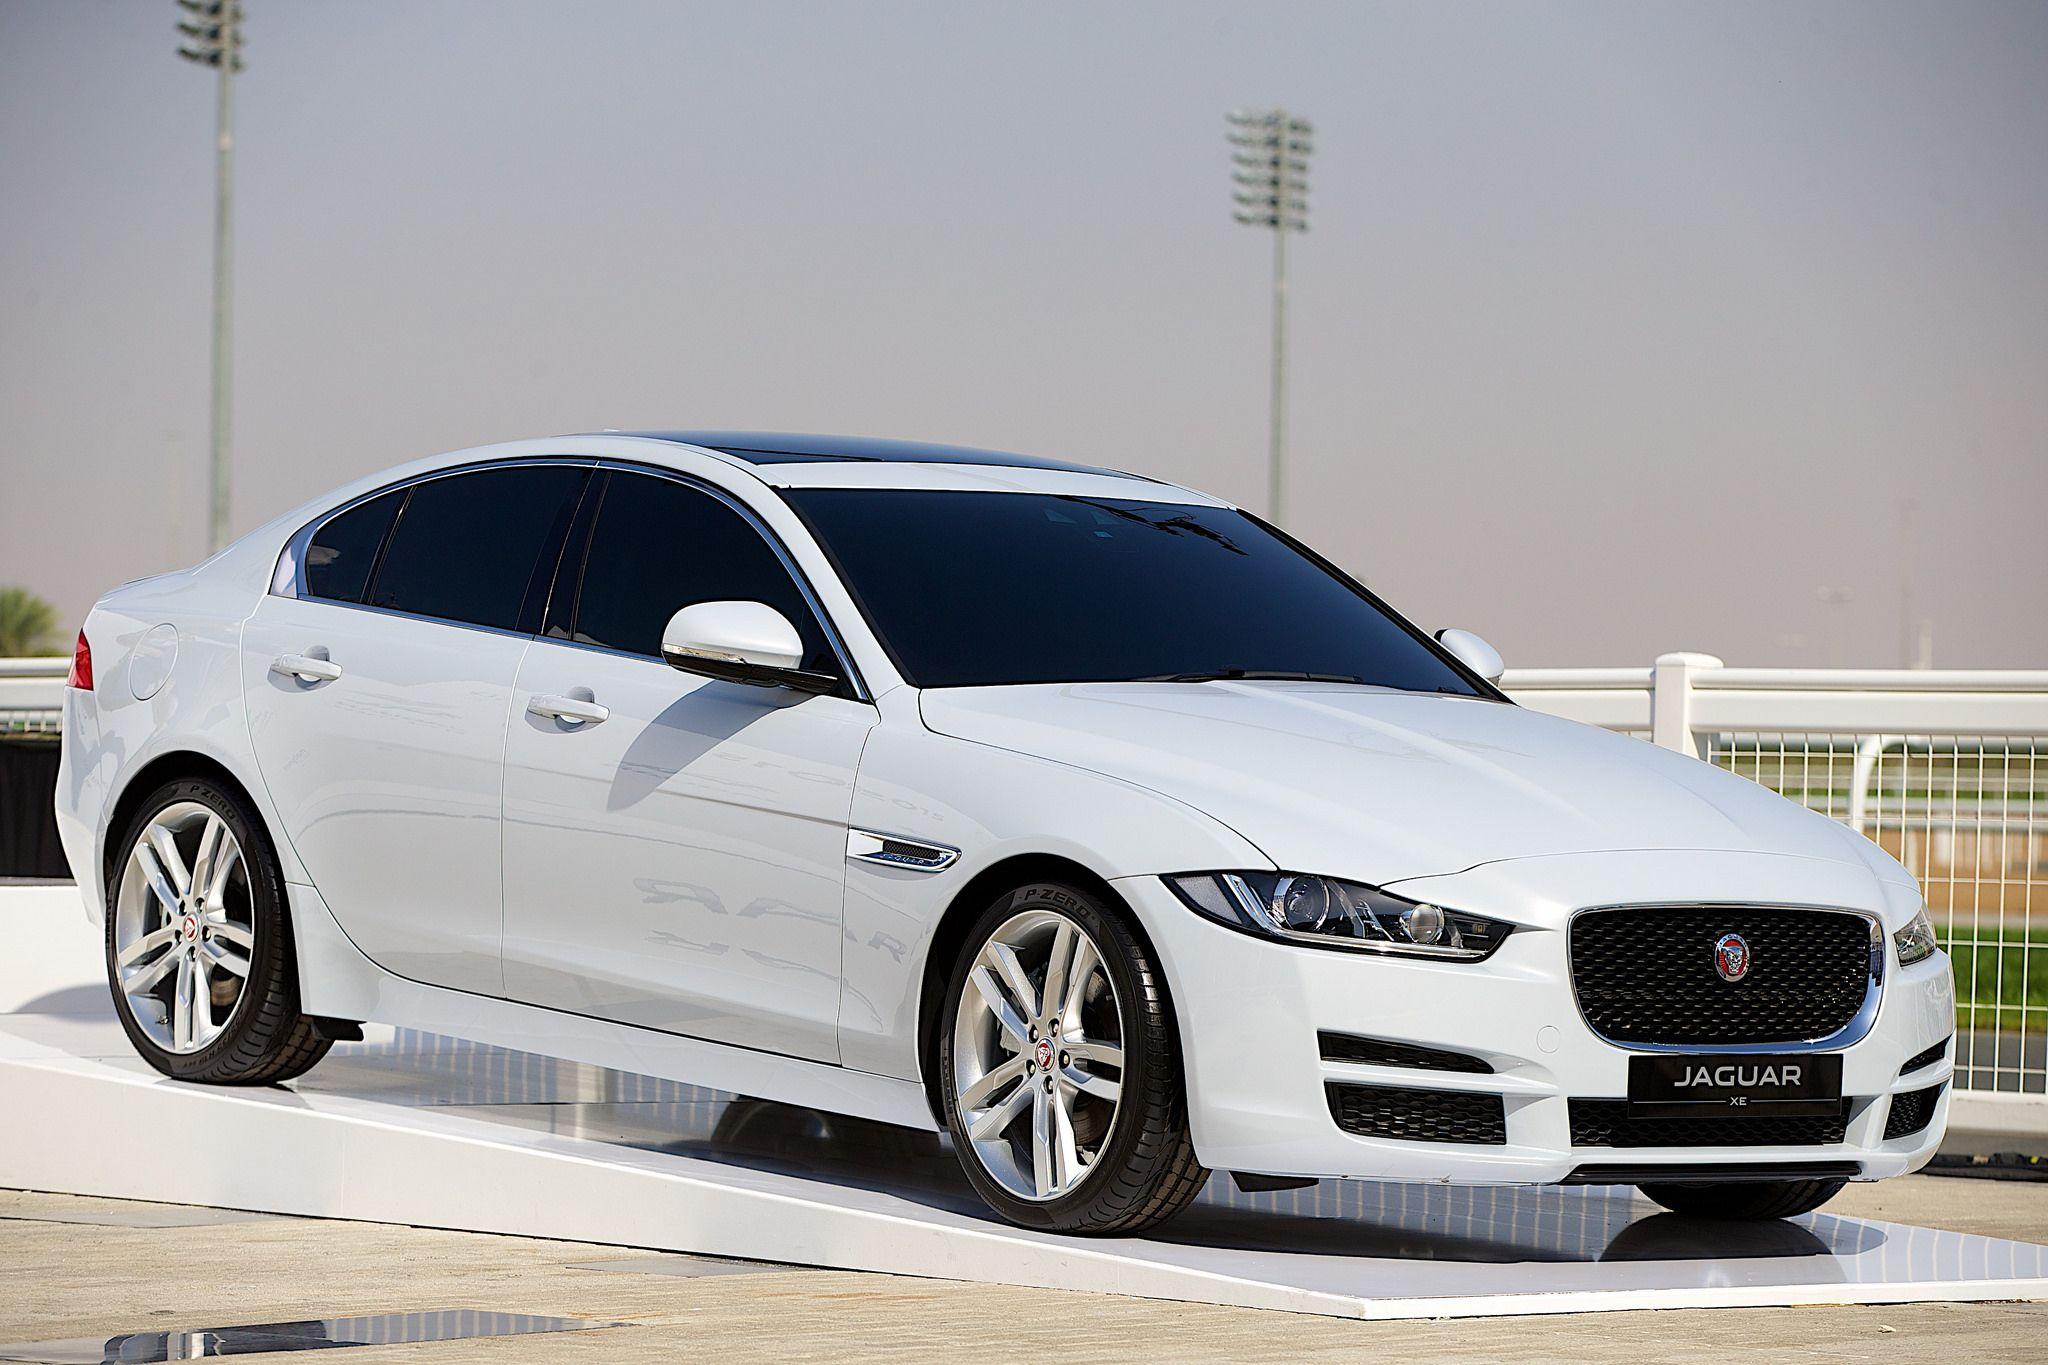 Jaguar Style Stakes At The 2015 Dubai World Cup Jaguar Xe Jaguar Car White Jaguar Car